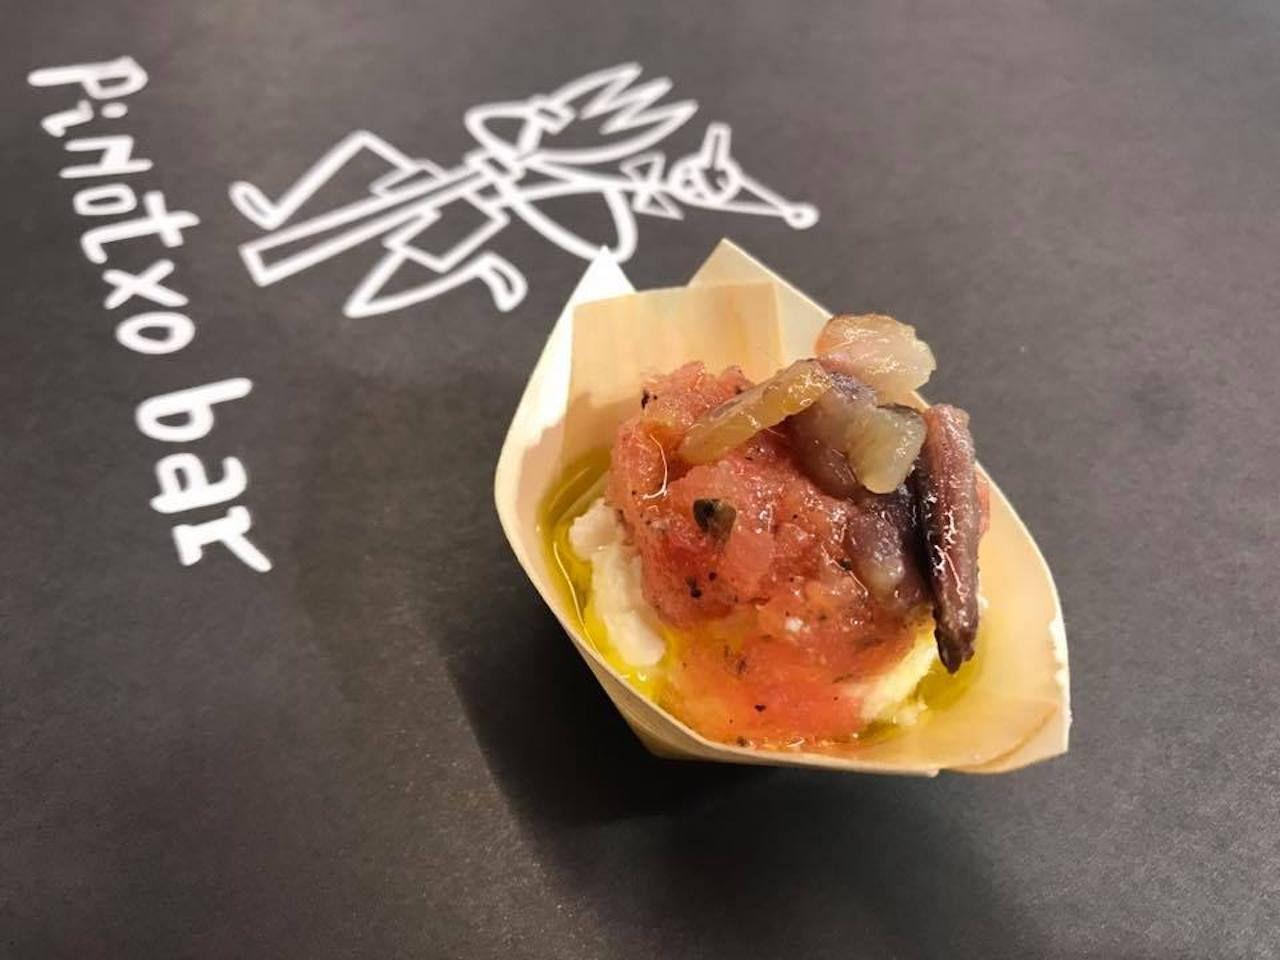 Tapas from Pinotxo Bar in Barcelona